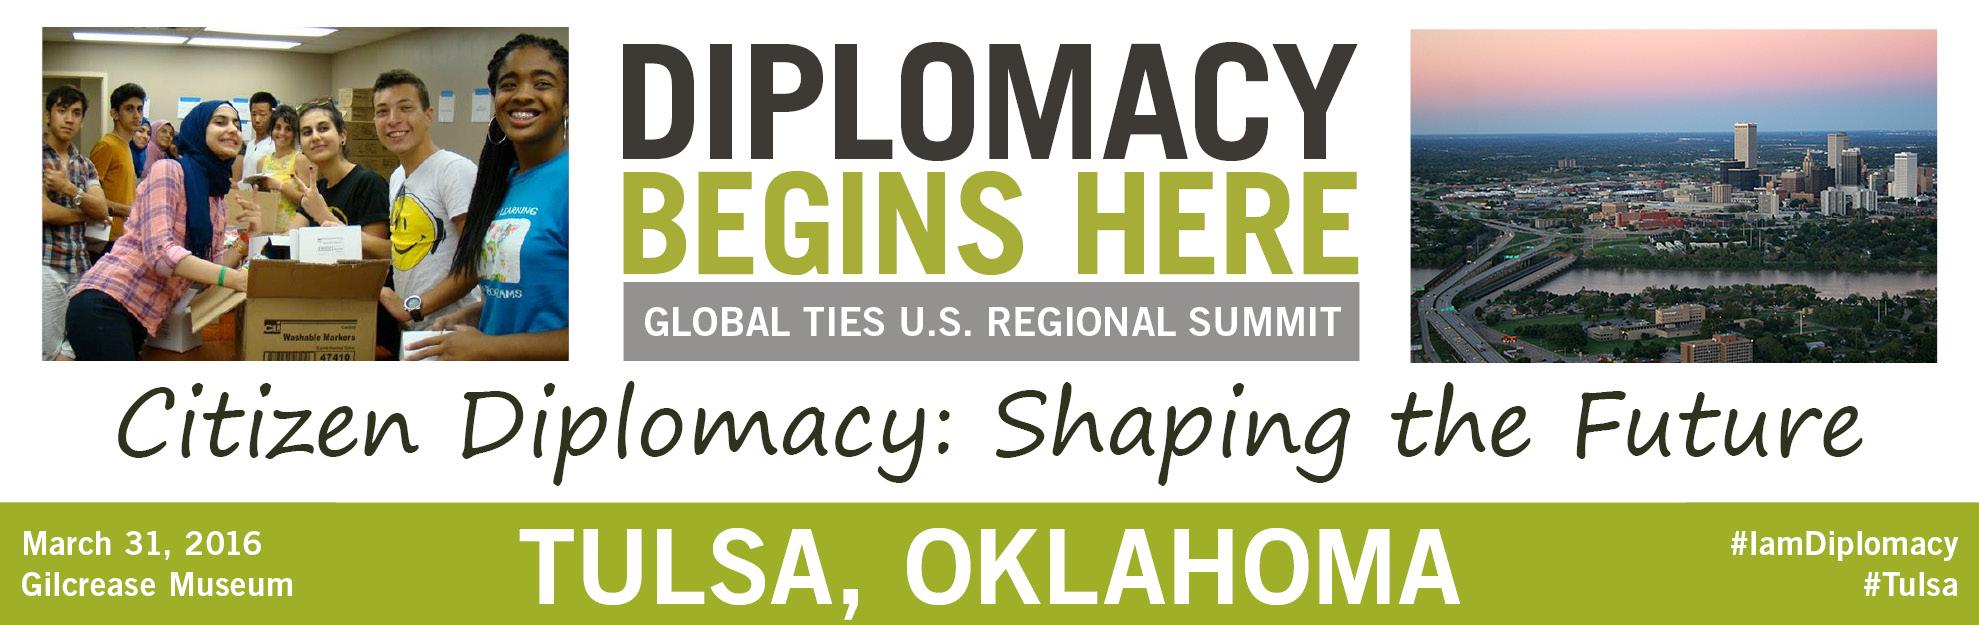 Diplomacy Begins Here: Tulsa, Oklahoma